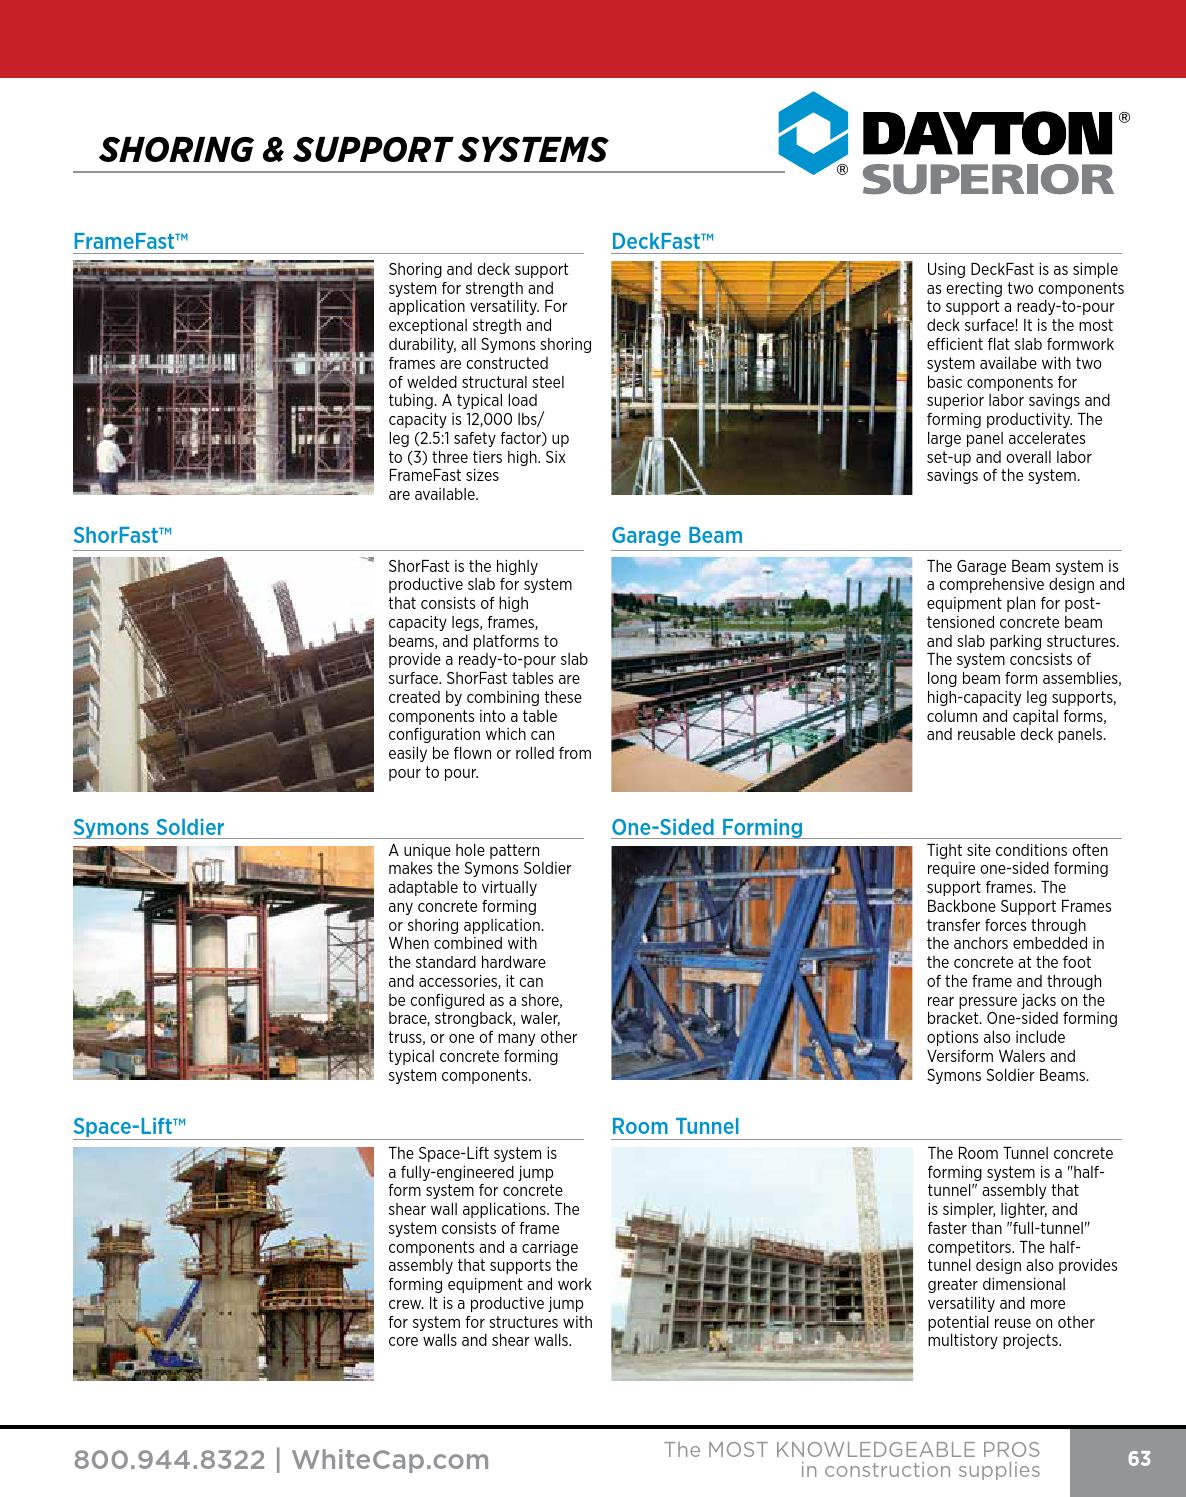 2014 concrete forming catalog by Randall Hall - issuu